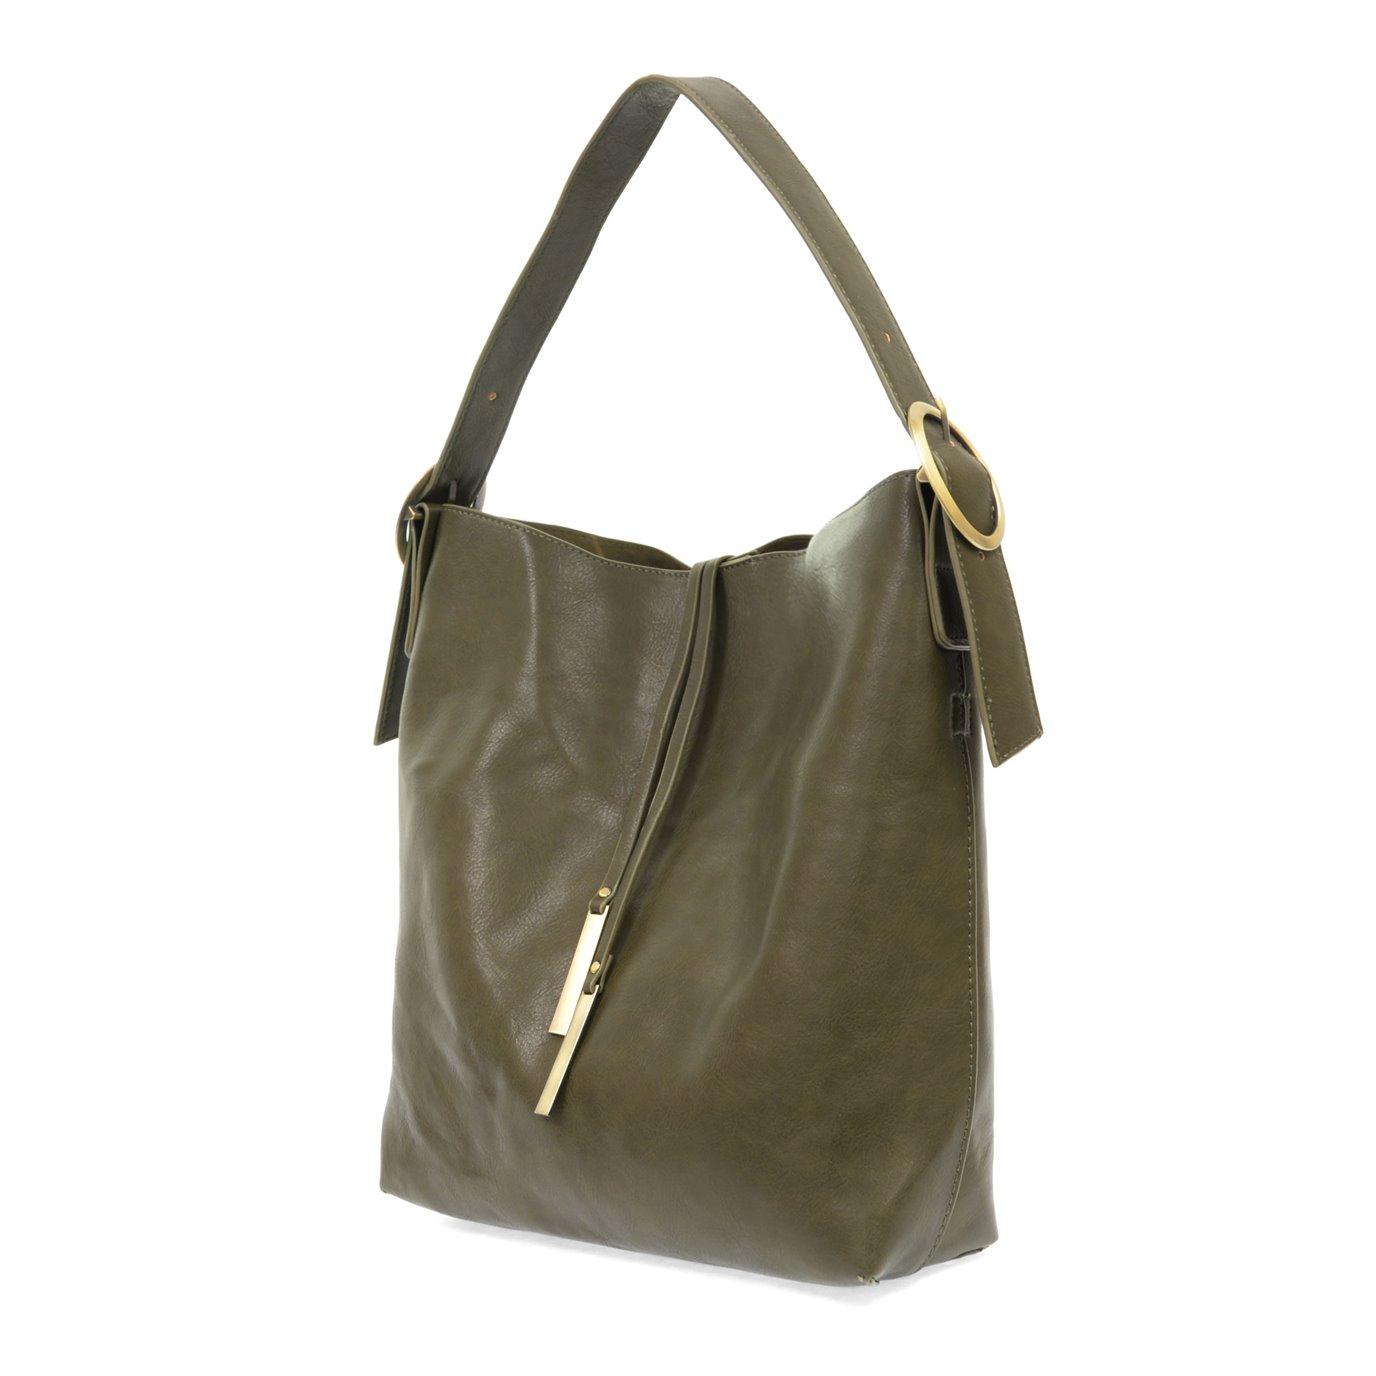 Olive Jillian Hobo Handbag with Tassel